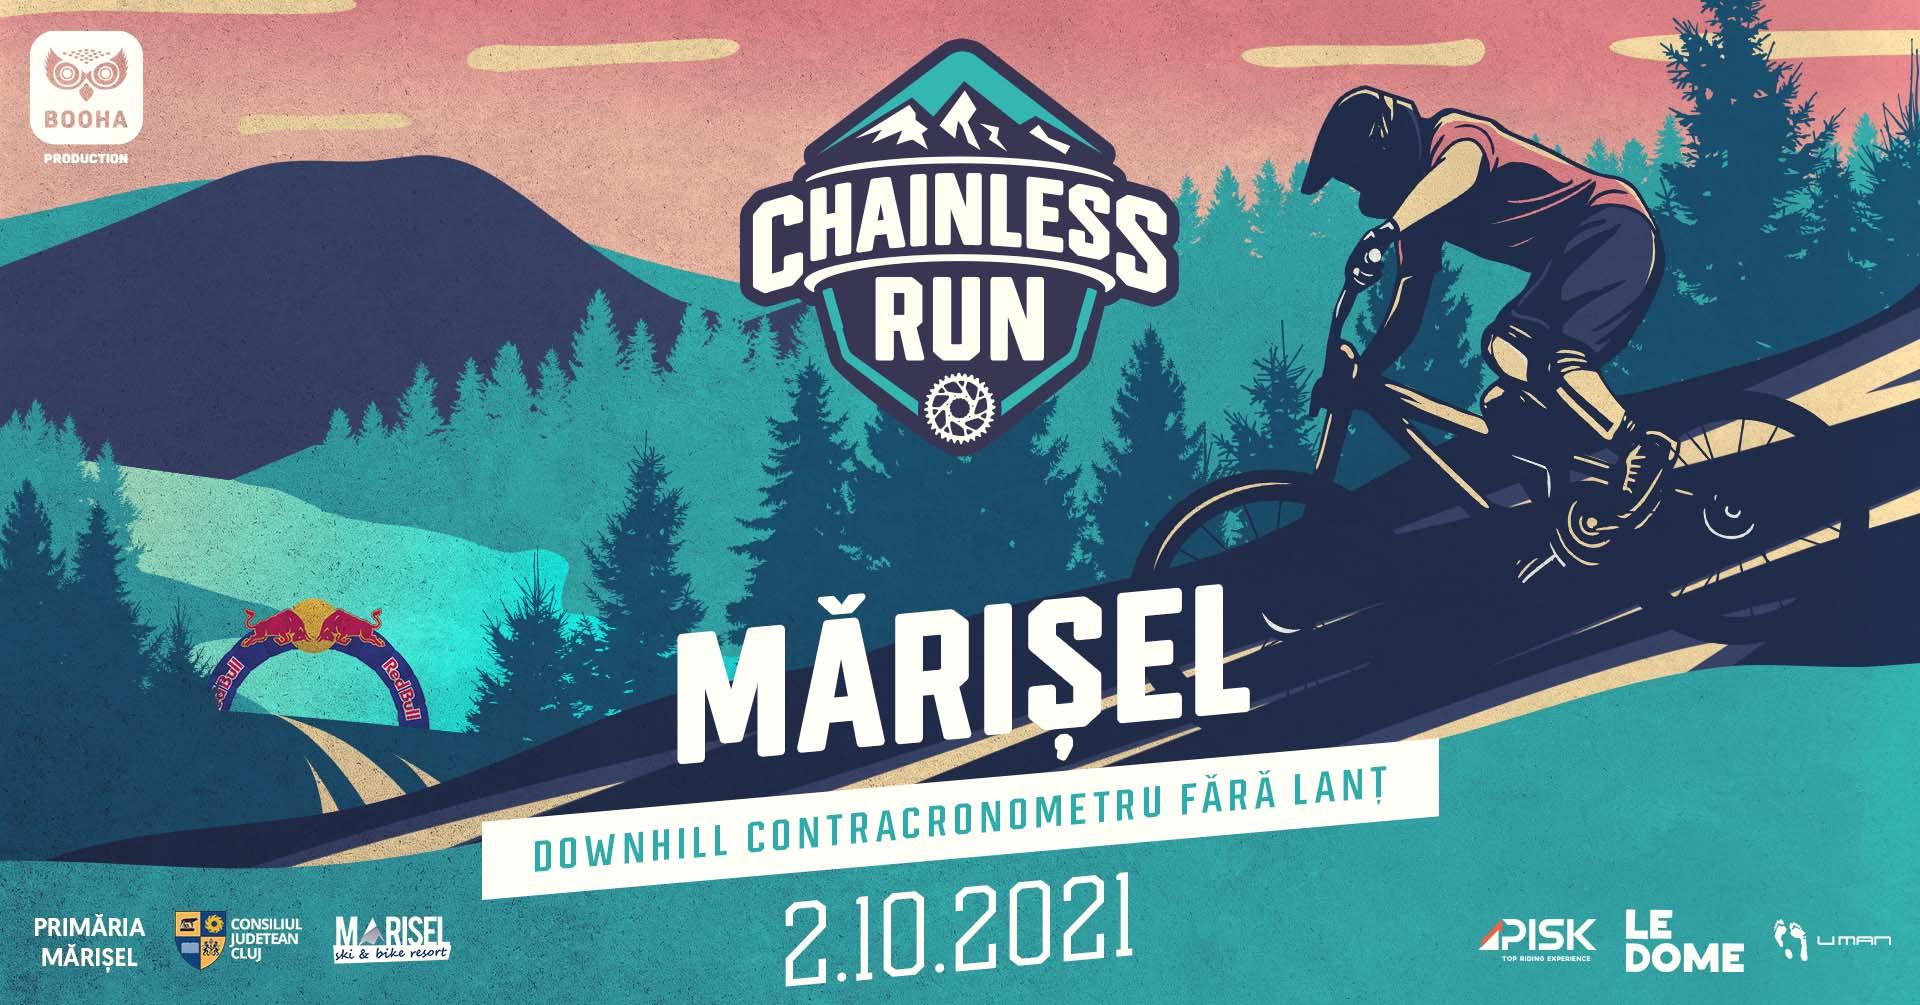 Chainless Run